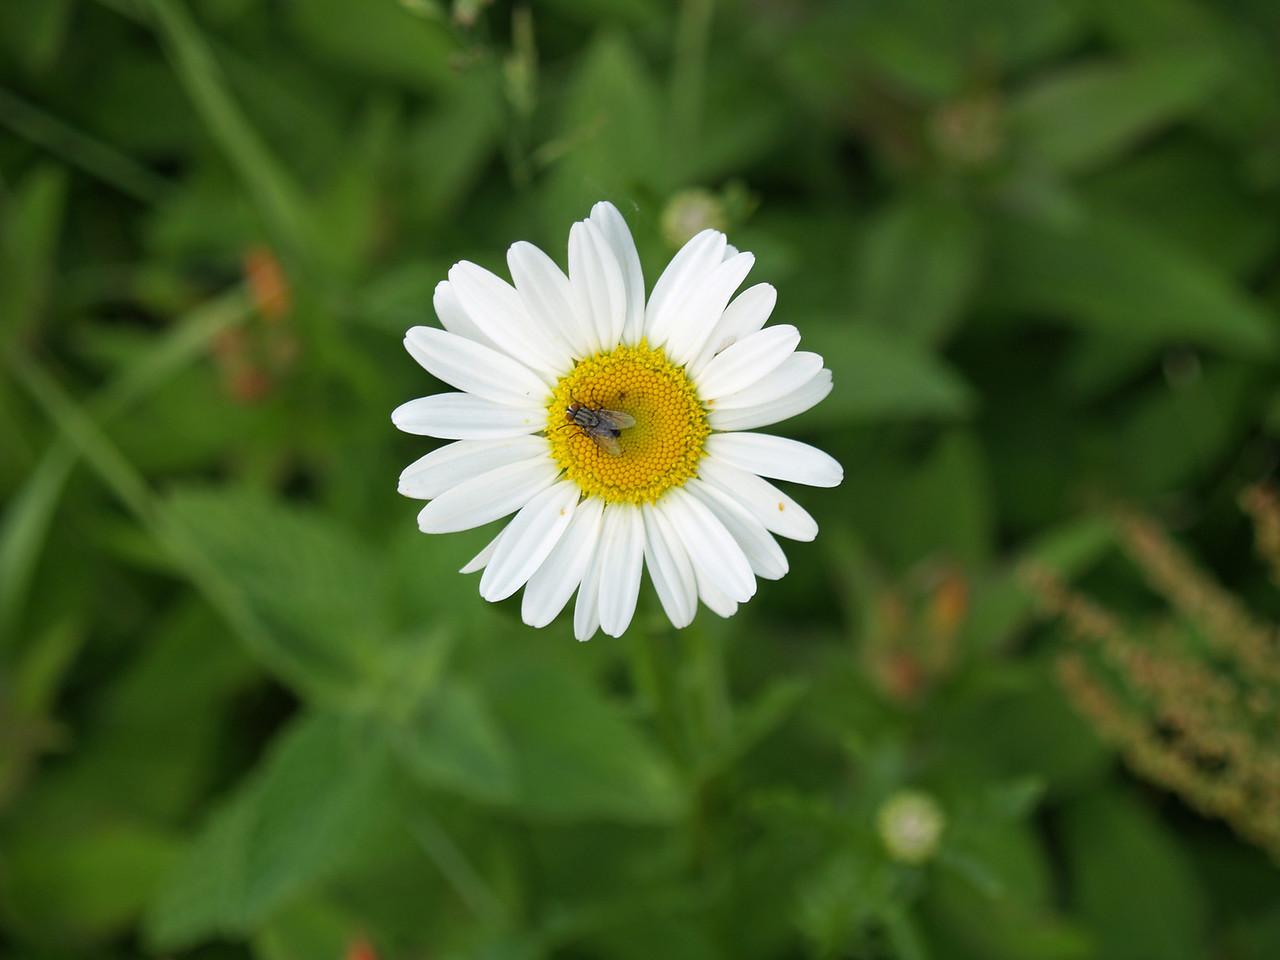 2314flyonflower